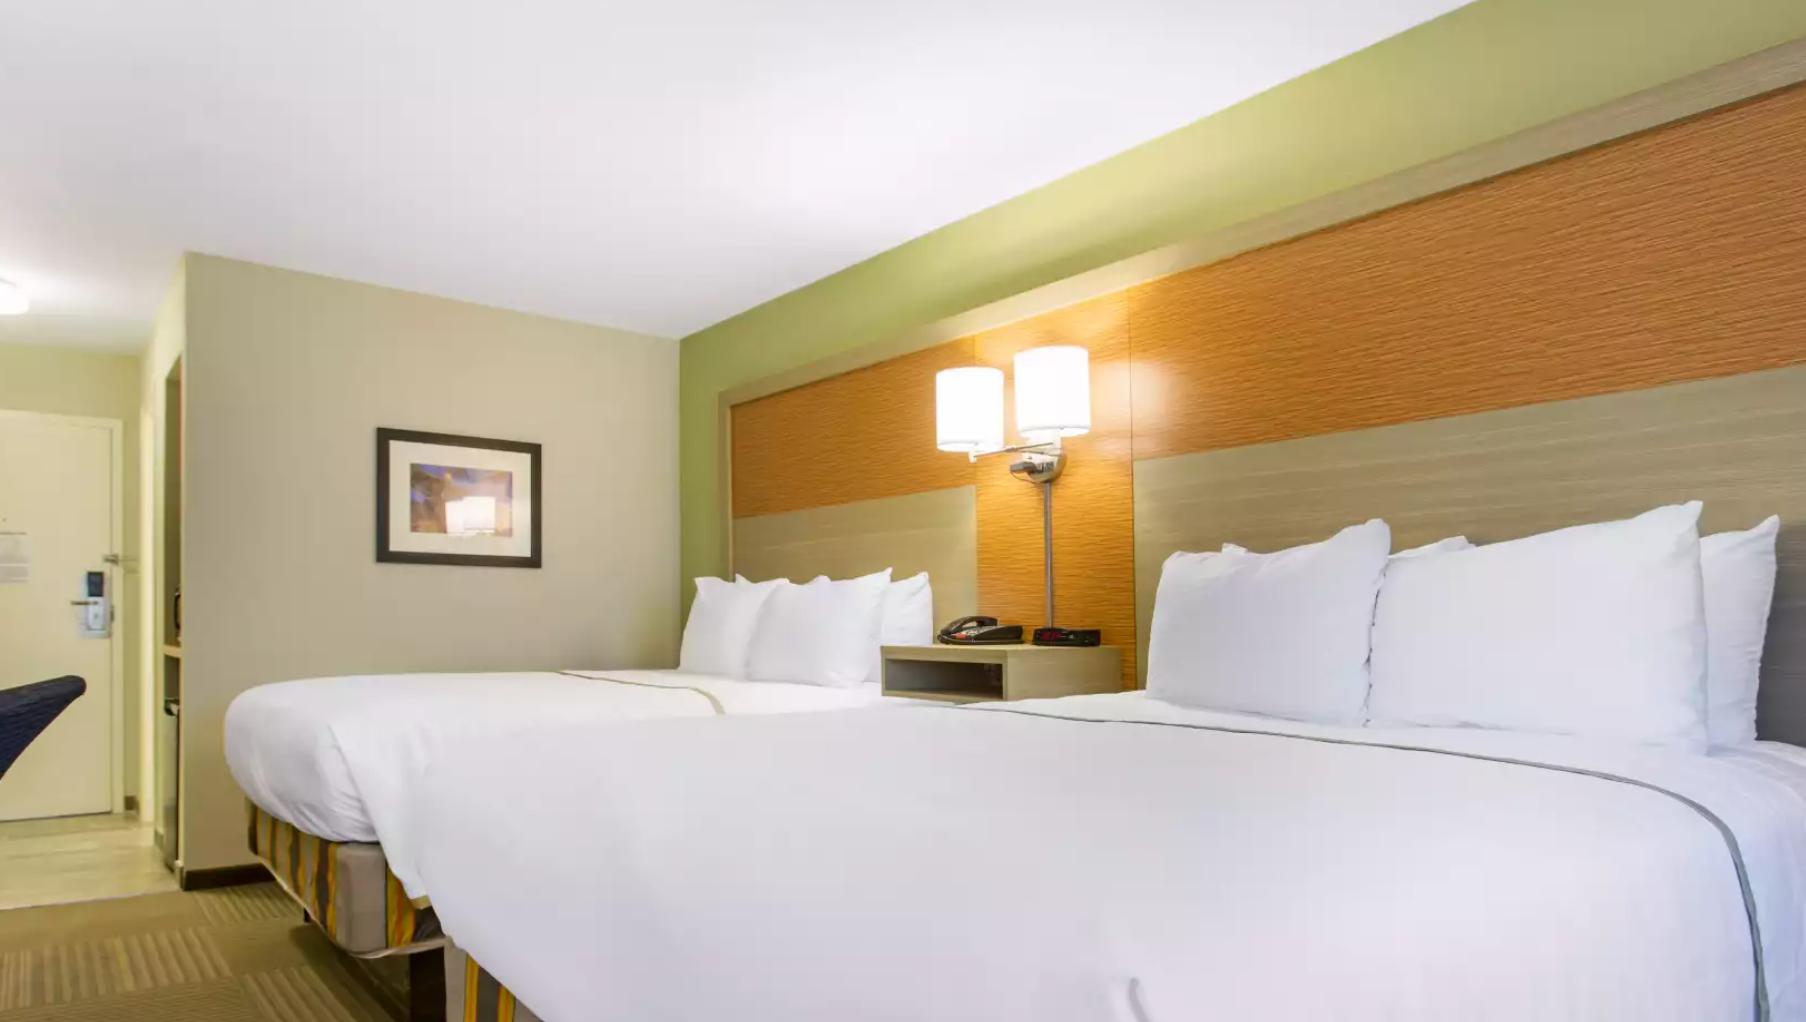 https://www.hotelsbyday.com/_data/default-hotel_image/3/19082/screenshot-2020-06-23-at-2-55-05-pm.png